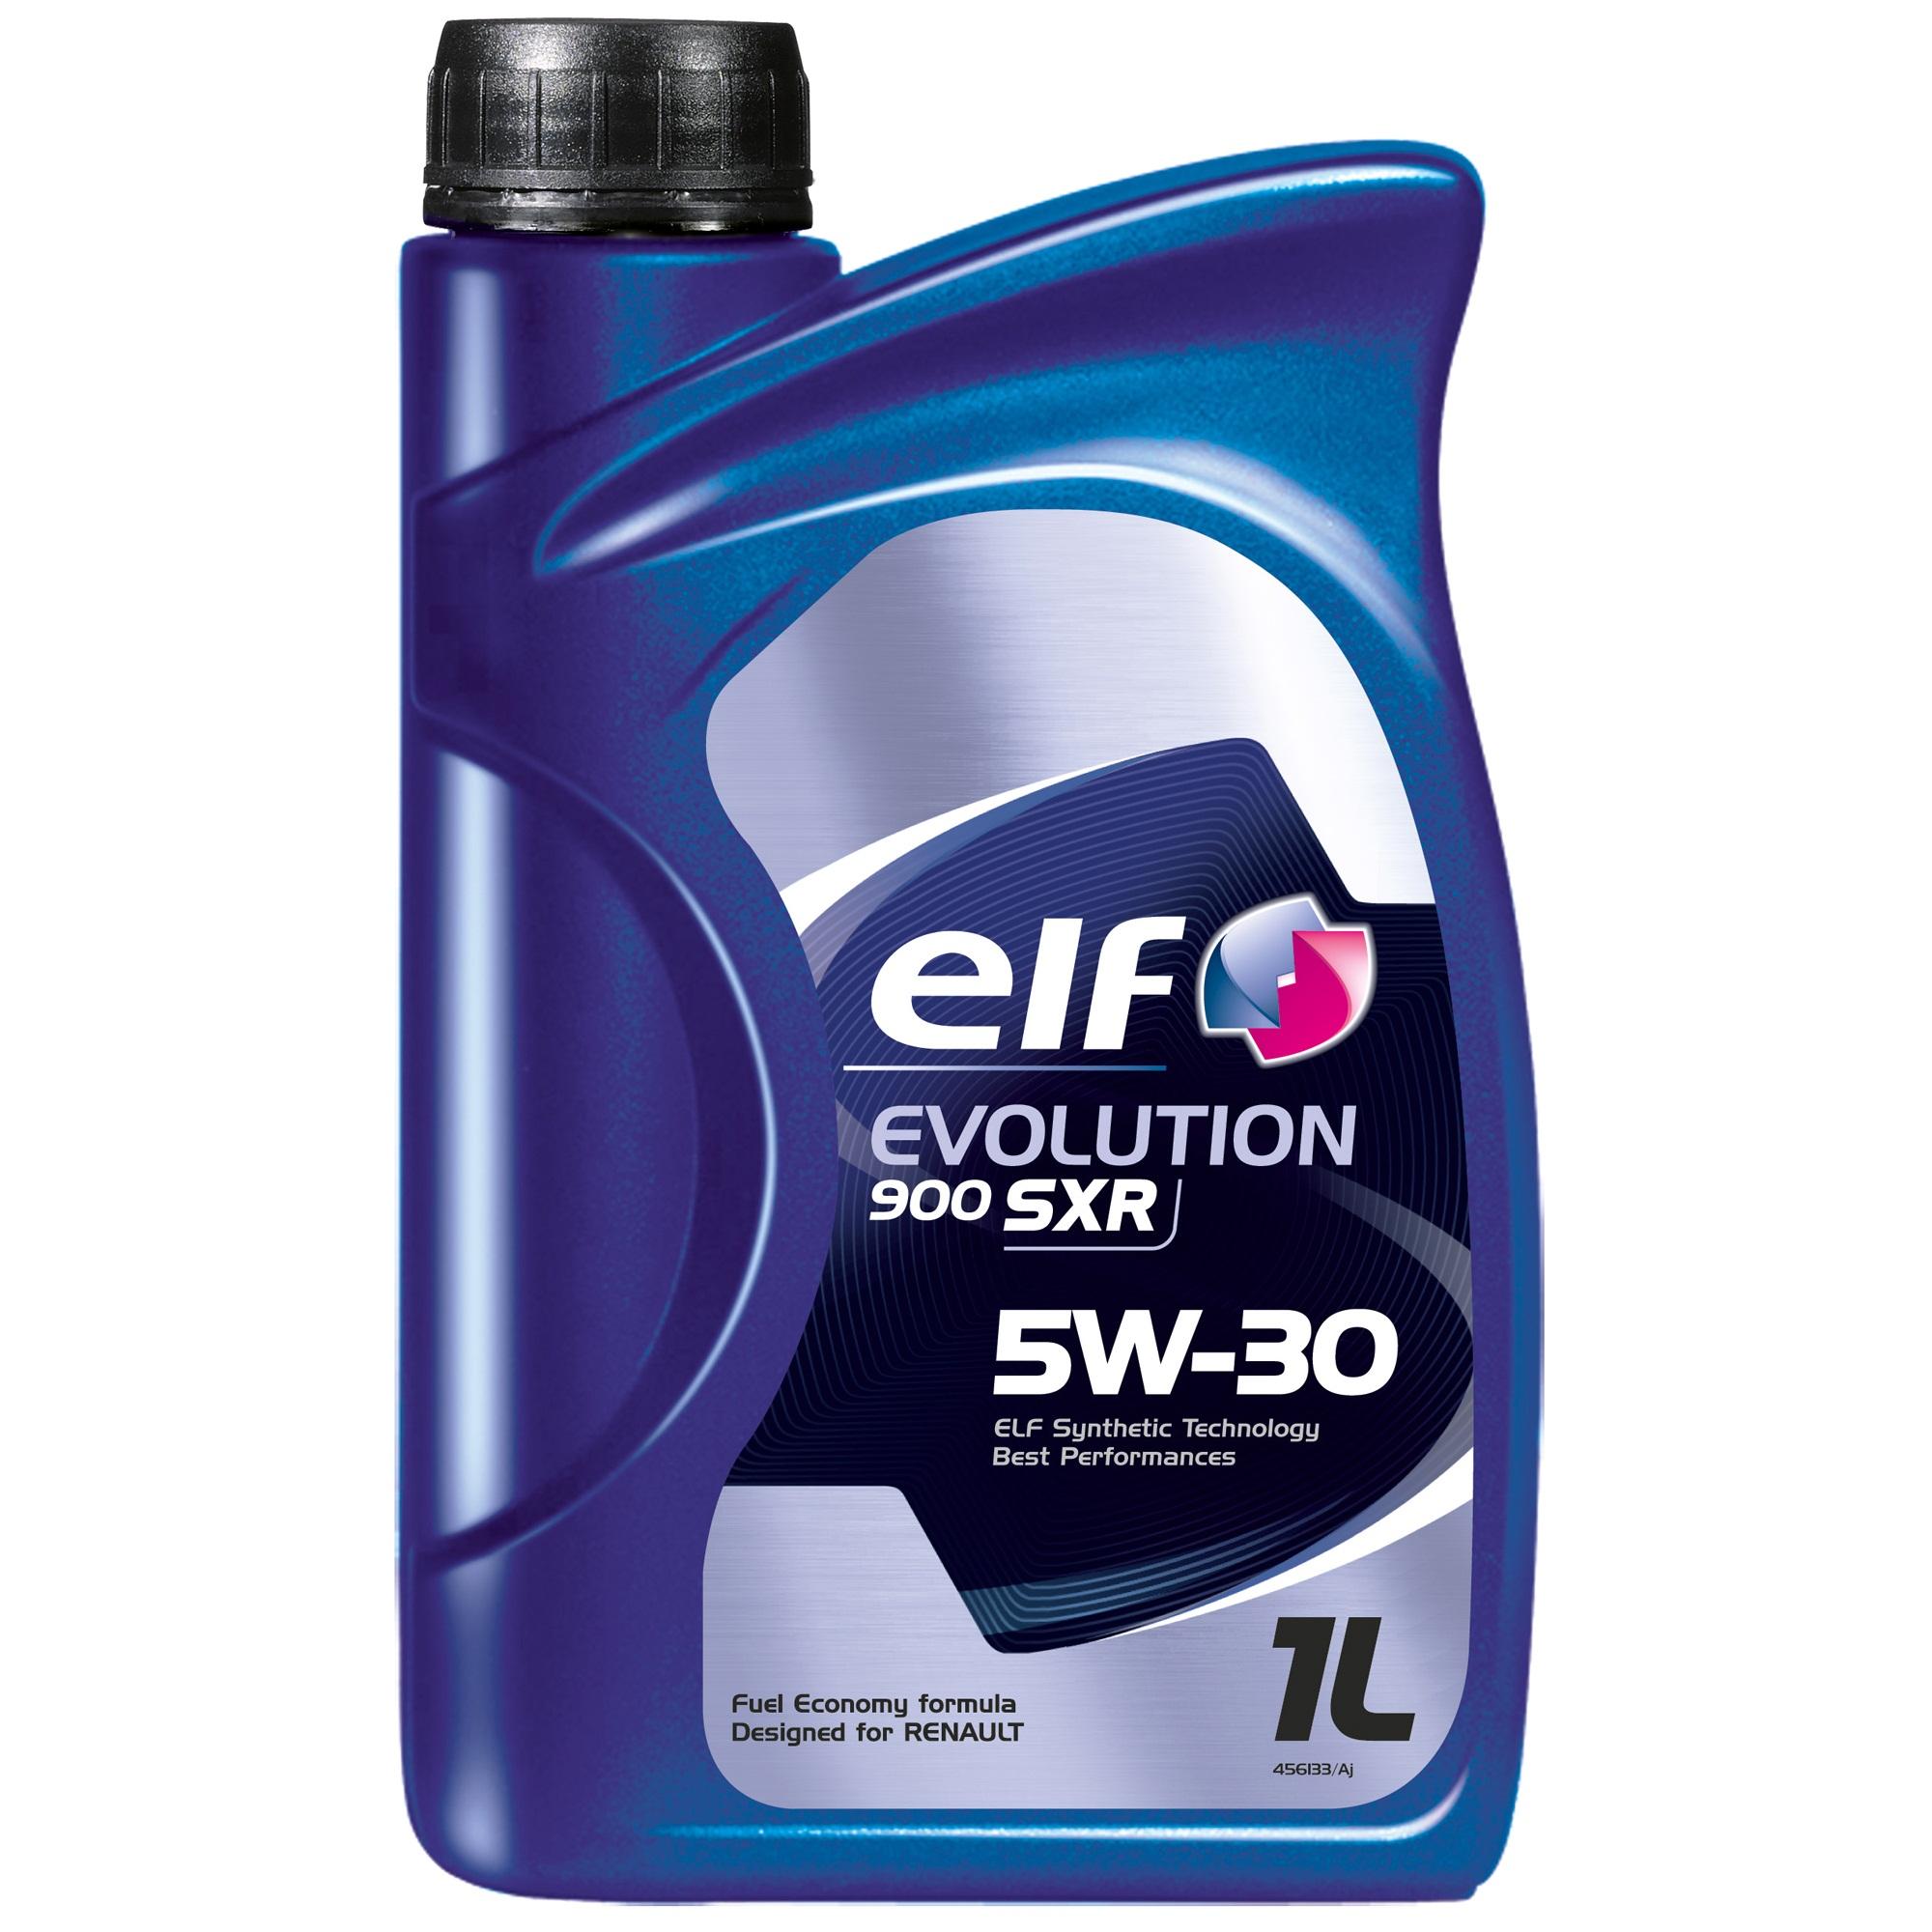 ULEI MOTOR ELF EVOLUTION 900 SXR 5W30 1L